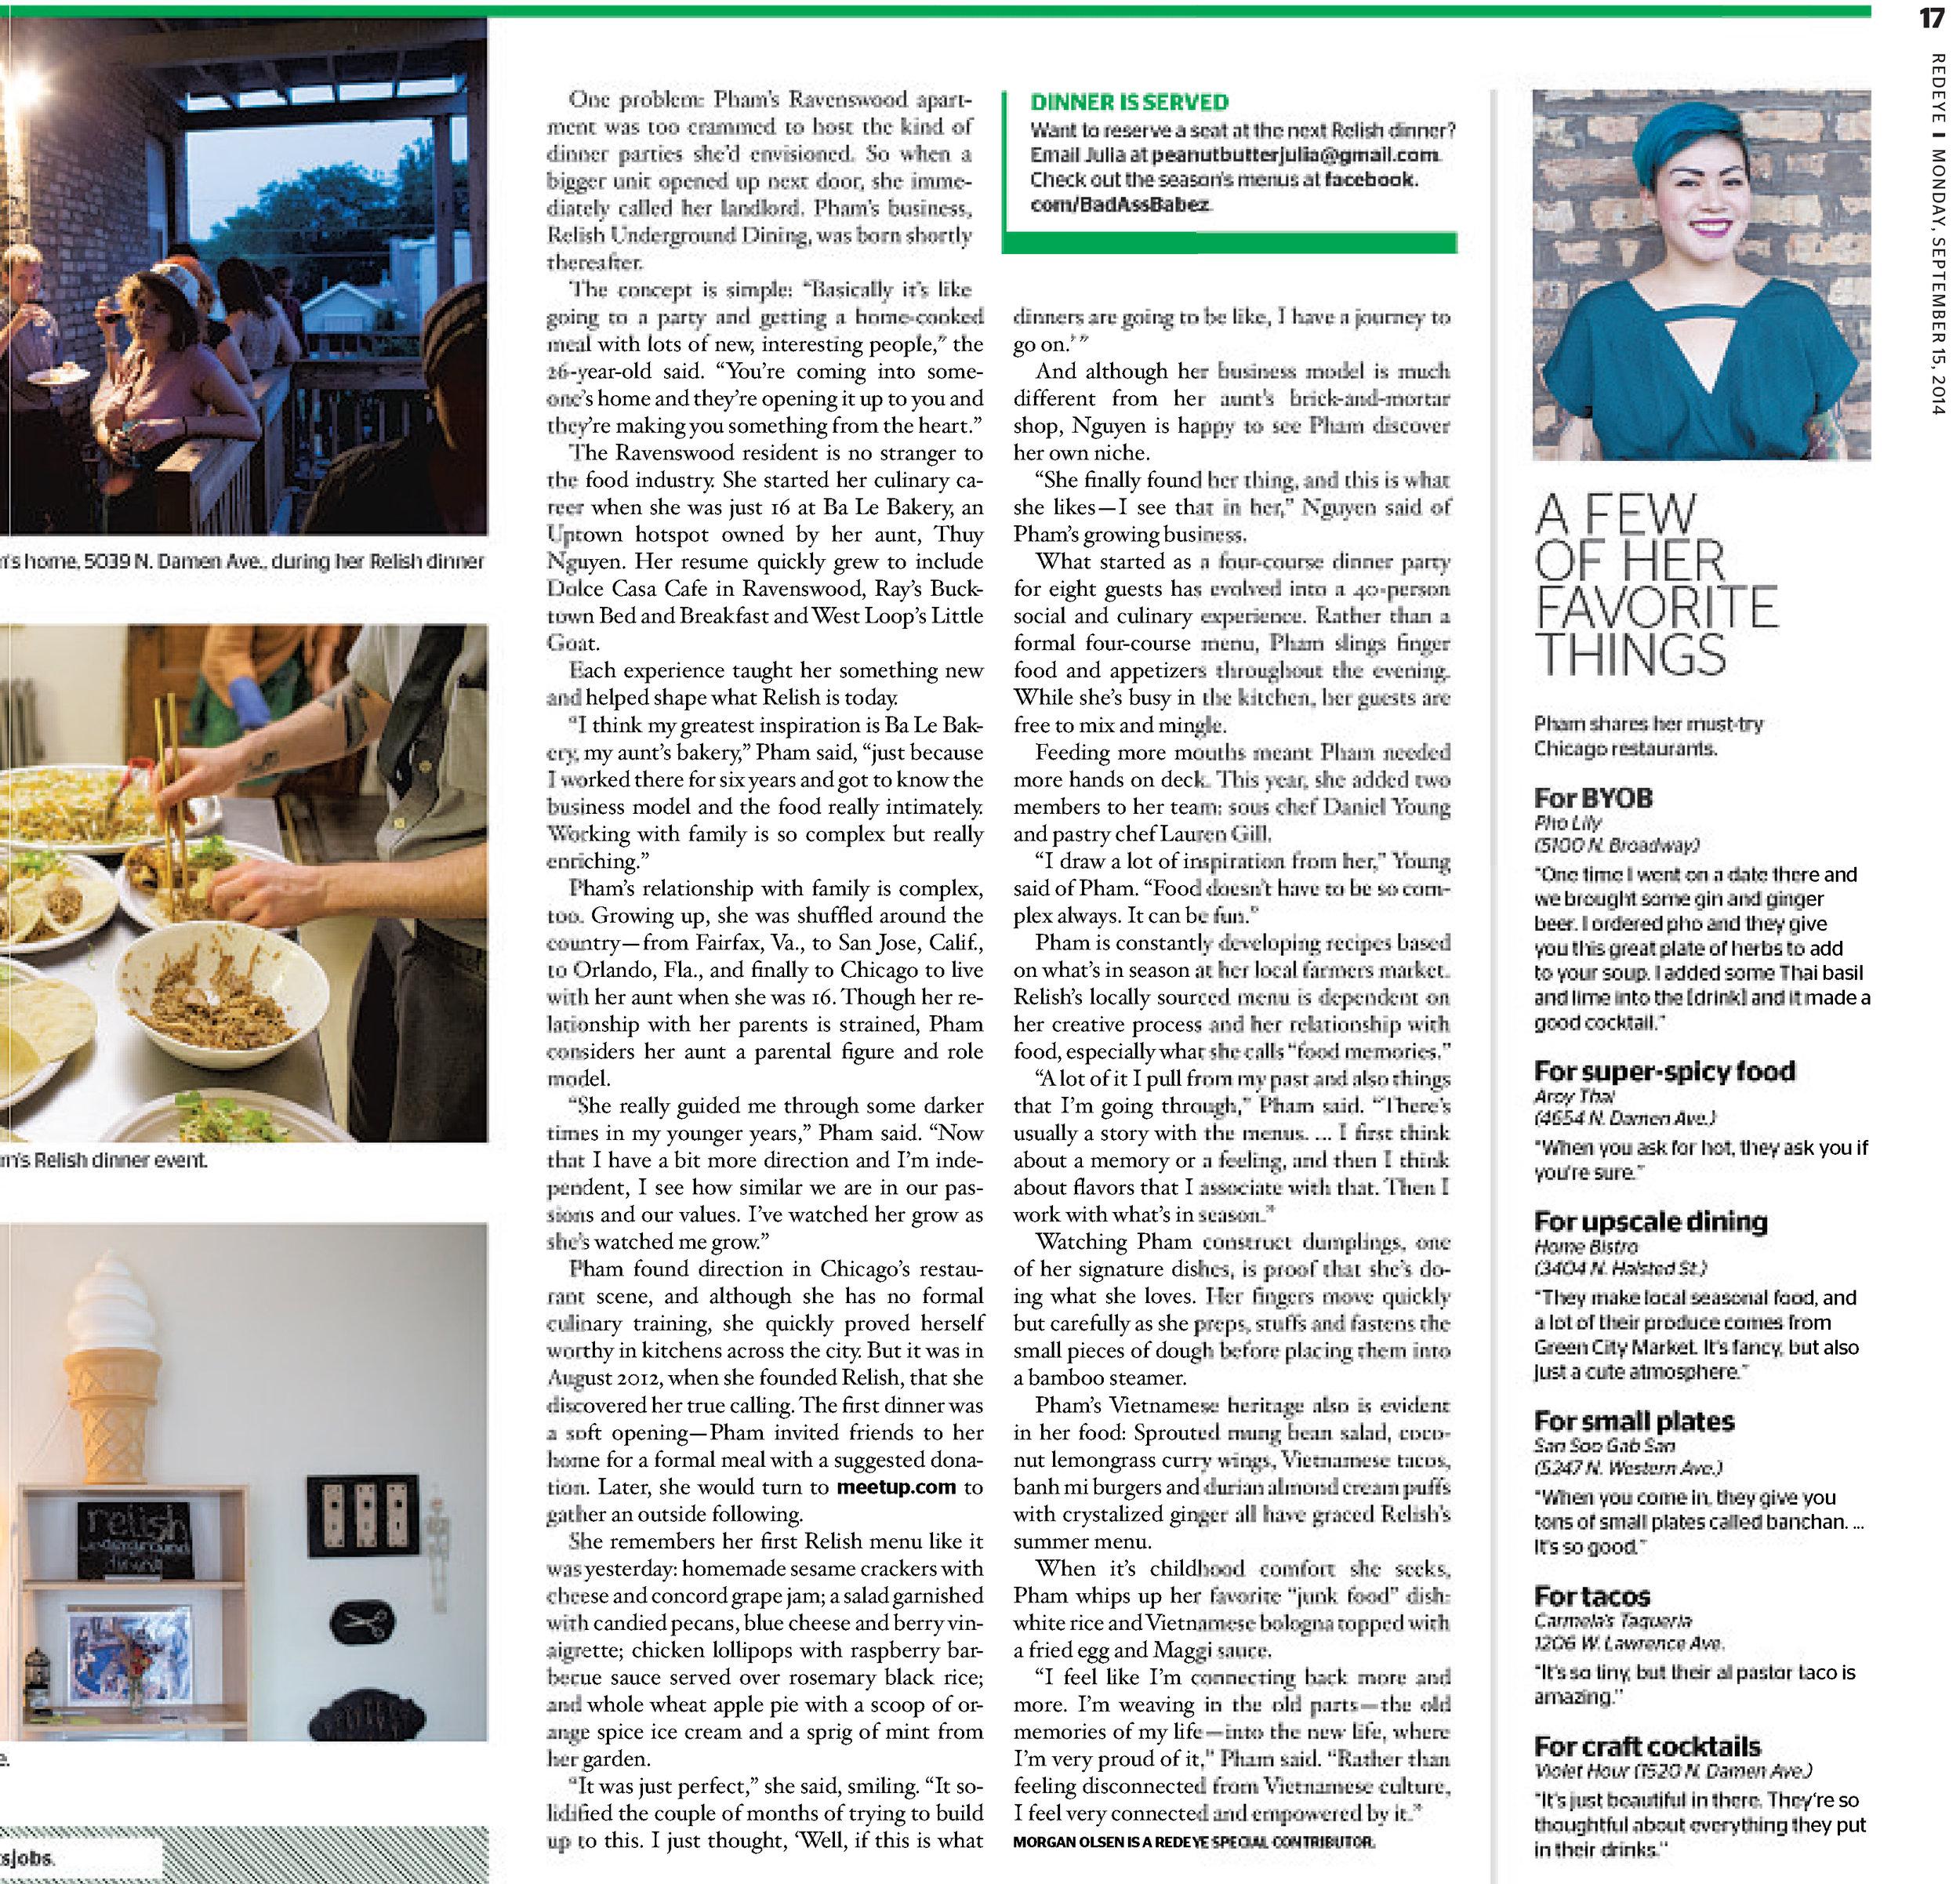 redeye-chicago-magazine-20140915-17aa.jpg